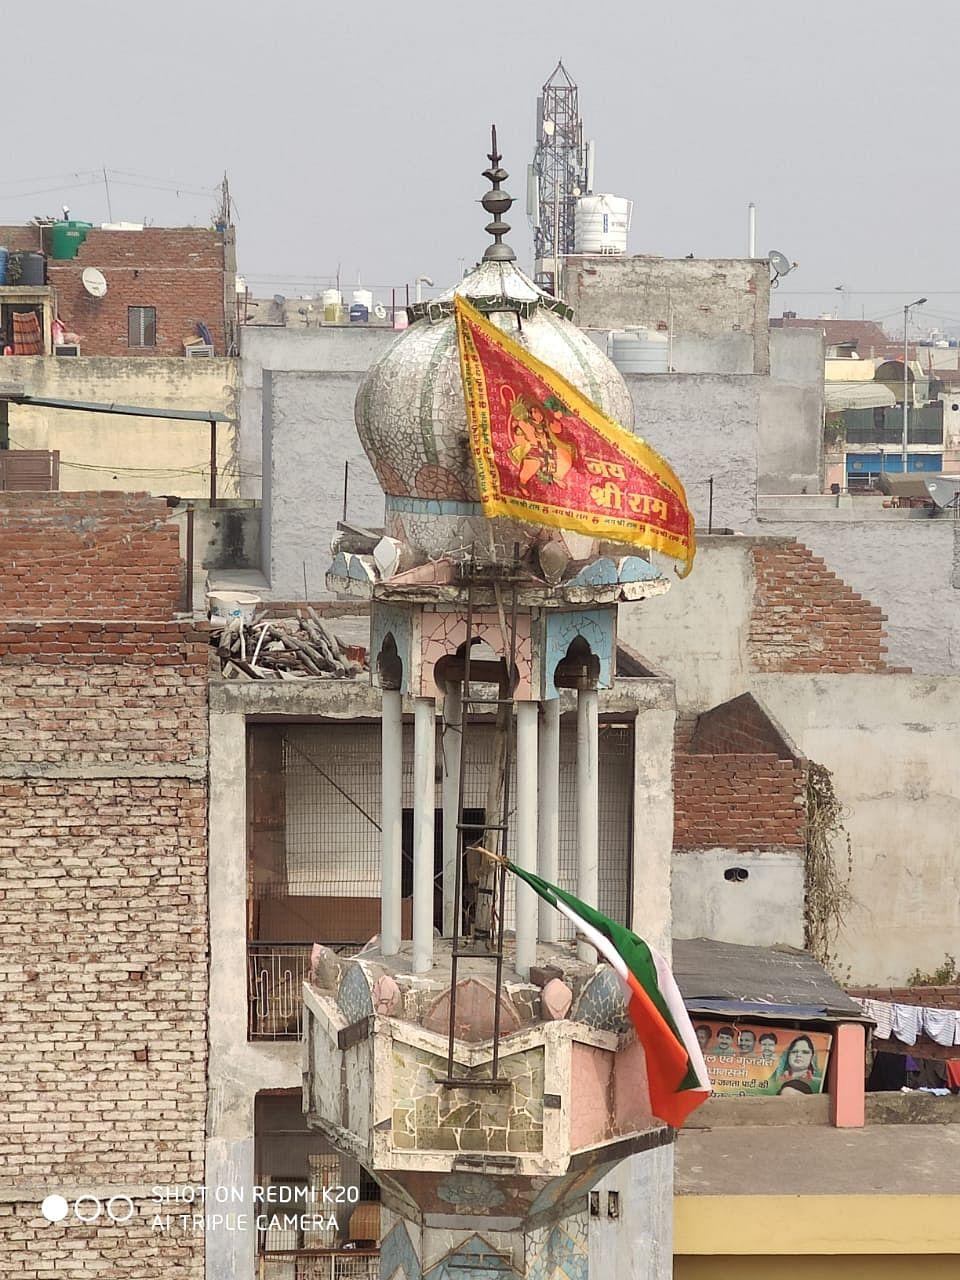 Flag Down, Repair Work Underway at Damaged Ashok Nagar Mosque